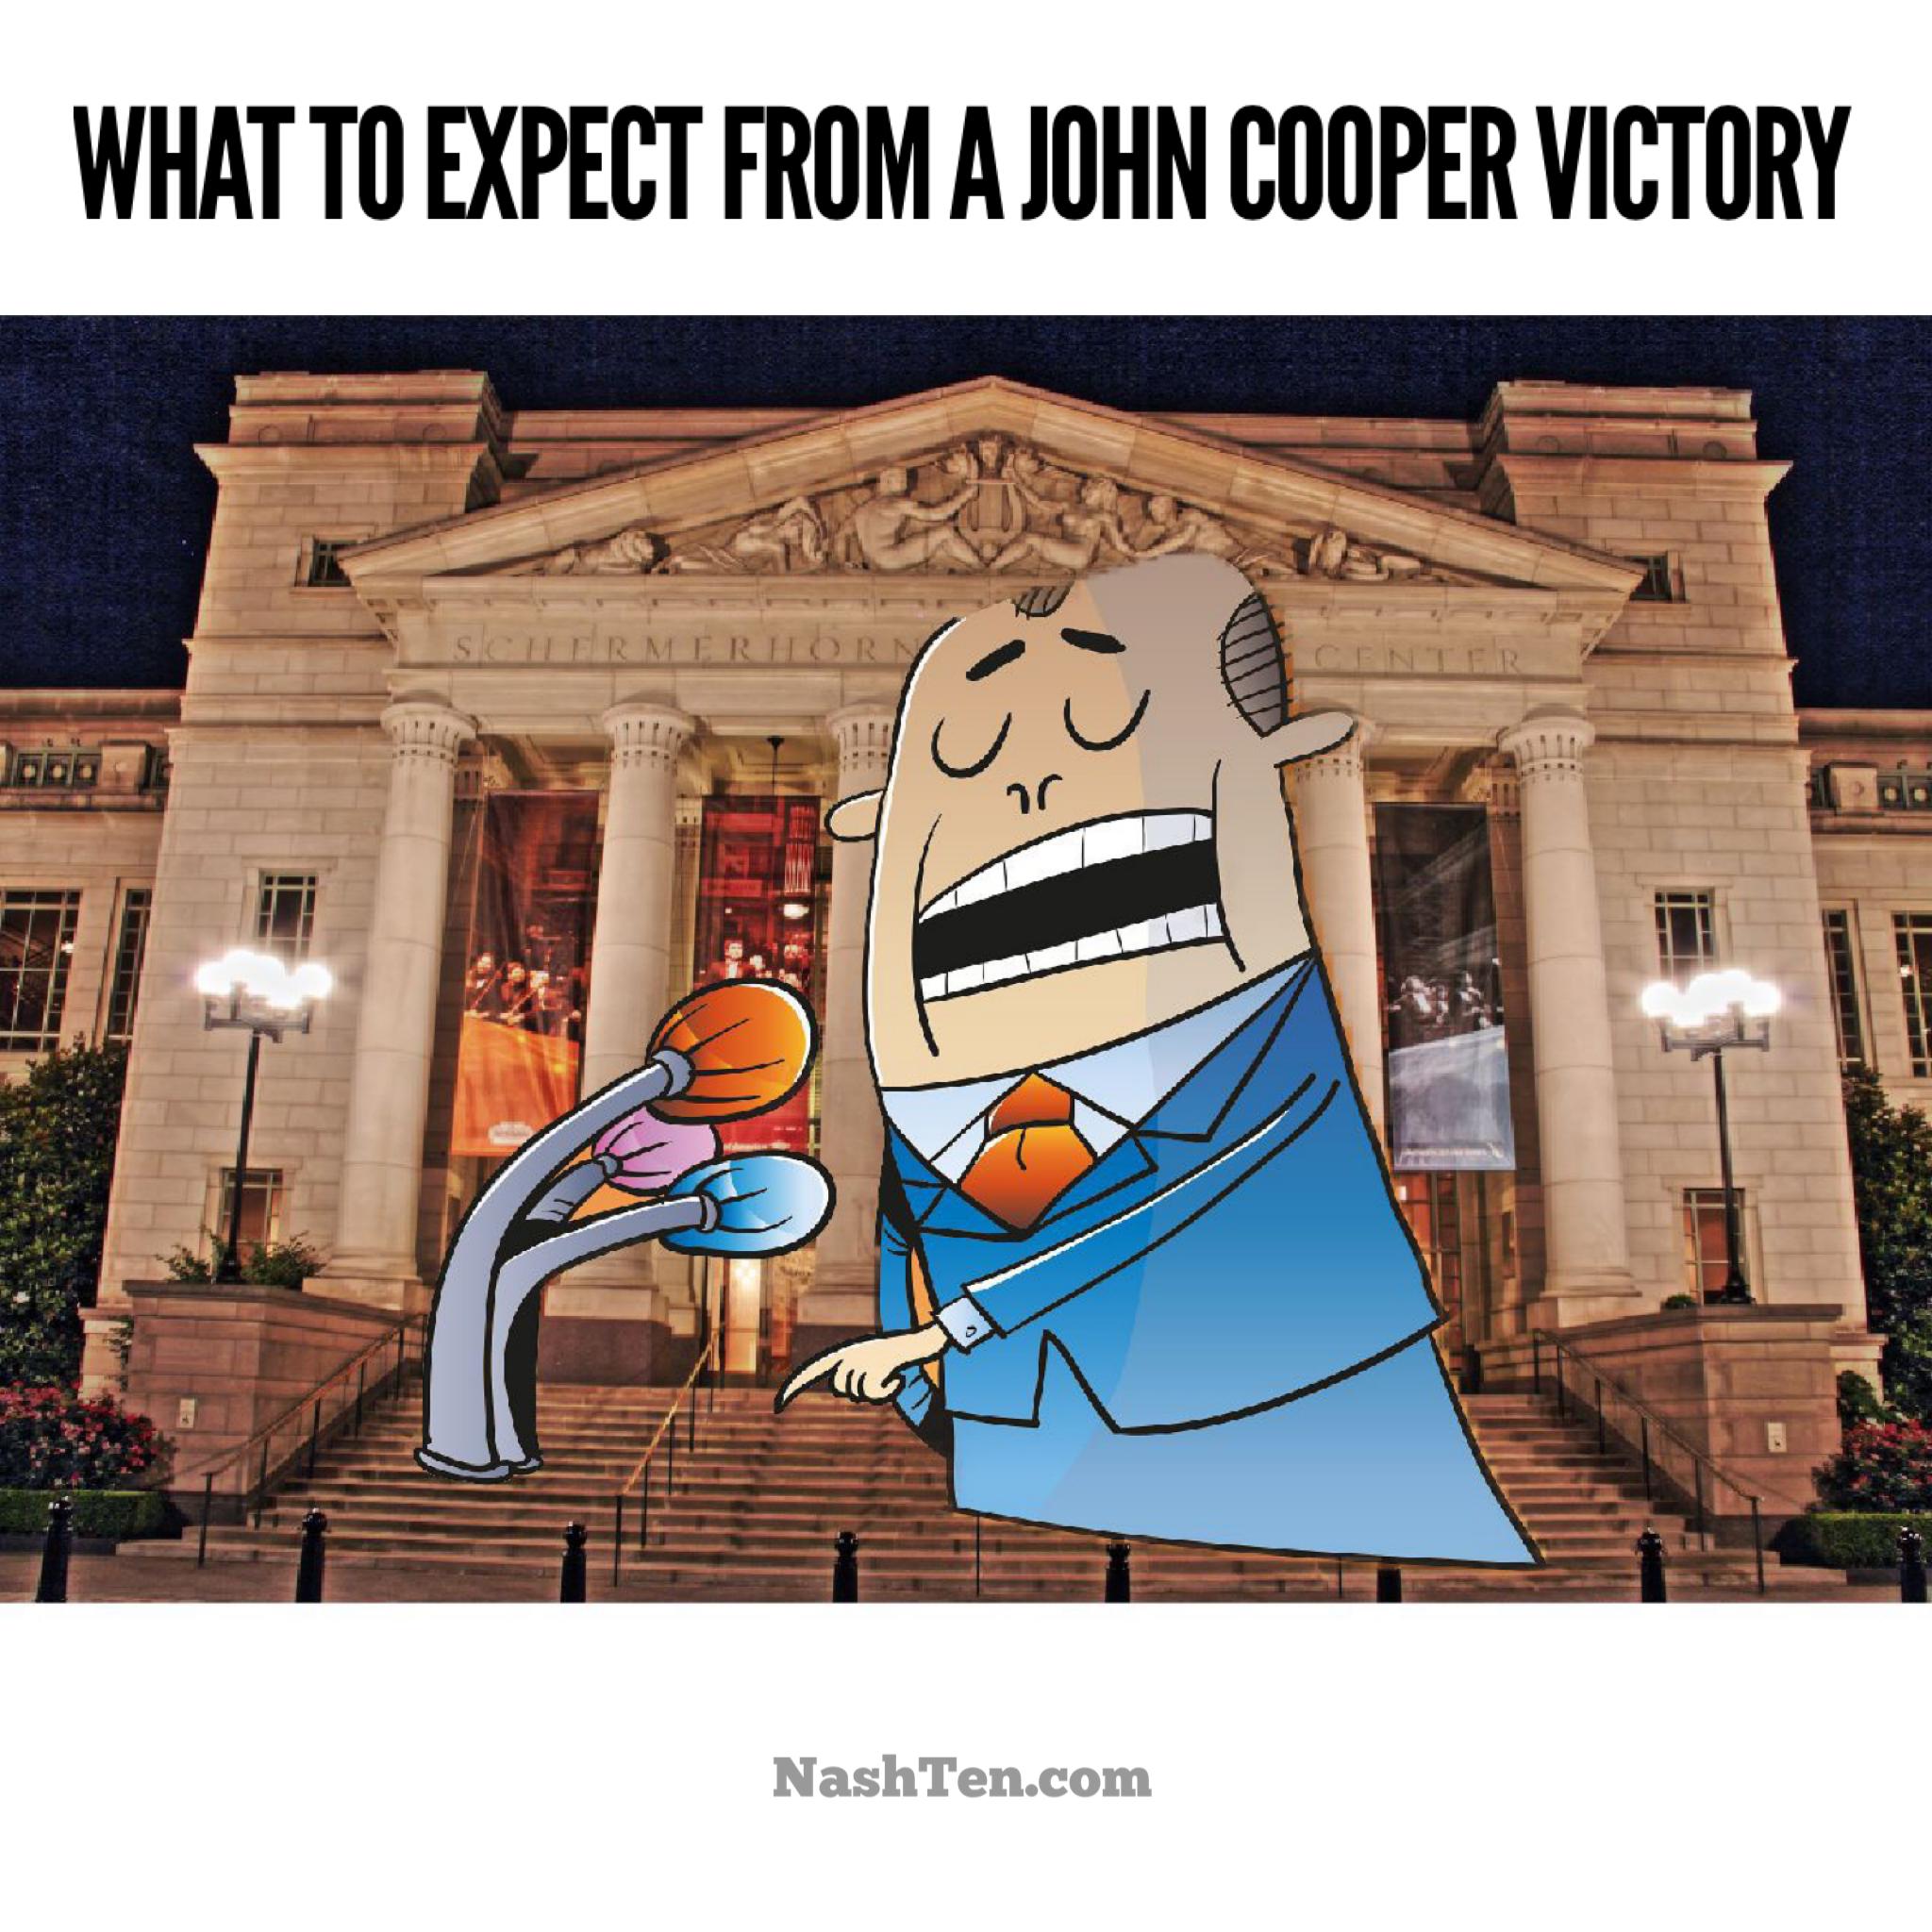 John Cooper victory in Nashville